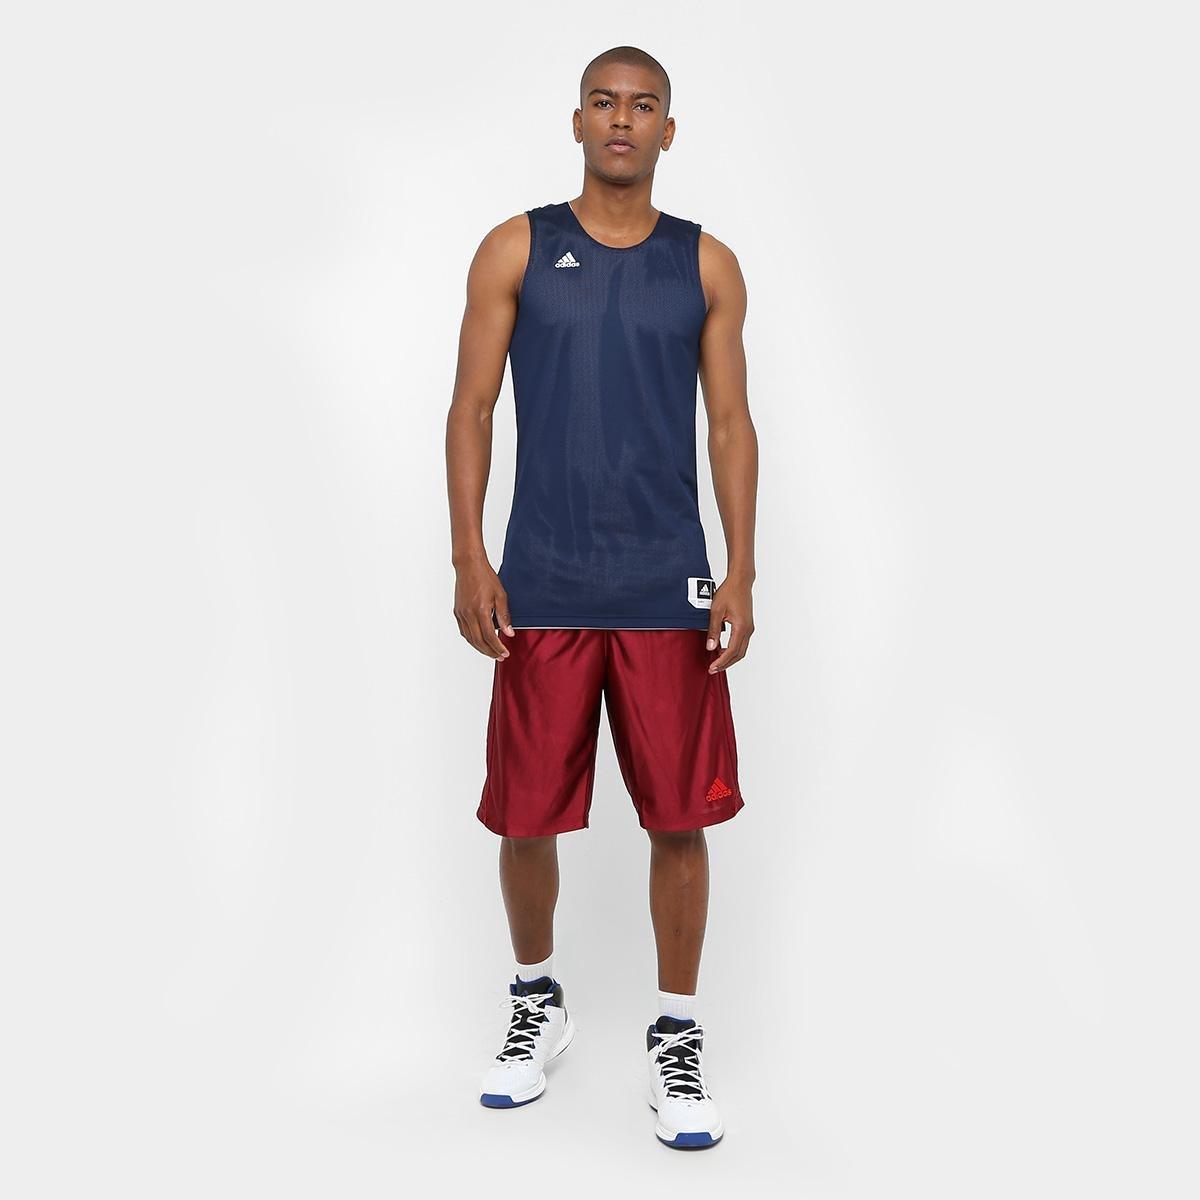 Camiseta Regata Adidas Treino Reversivel Masculina - Marinho ... 0f20dcadc7320